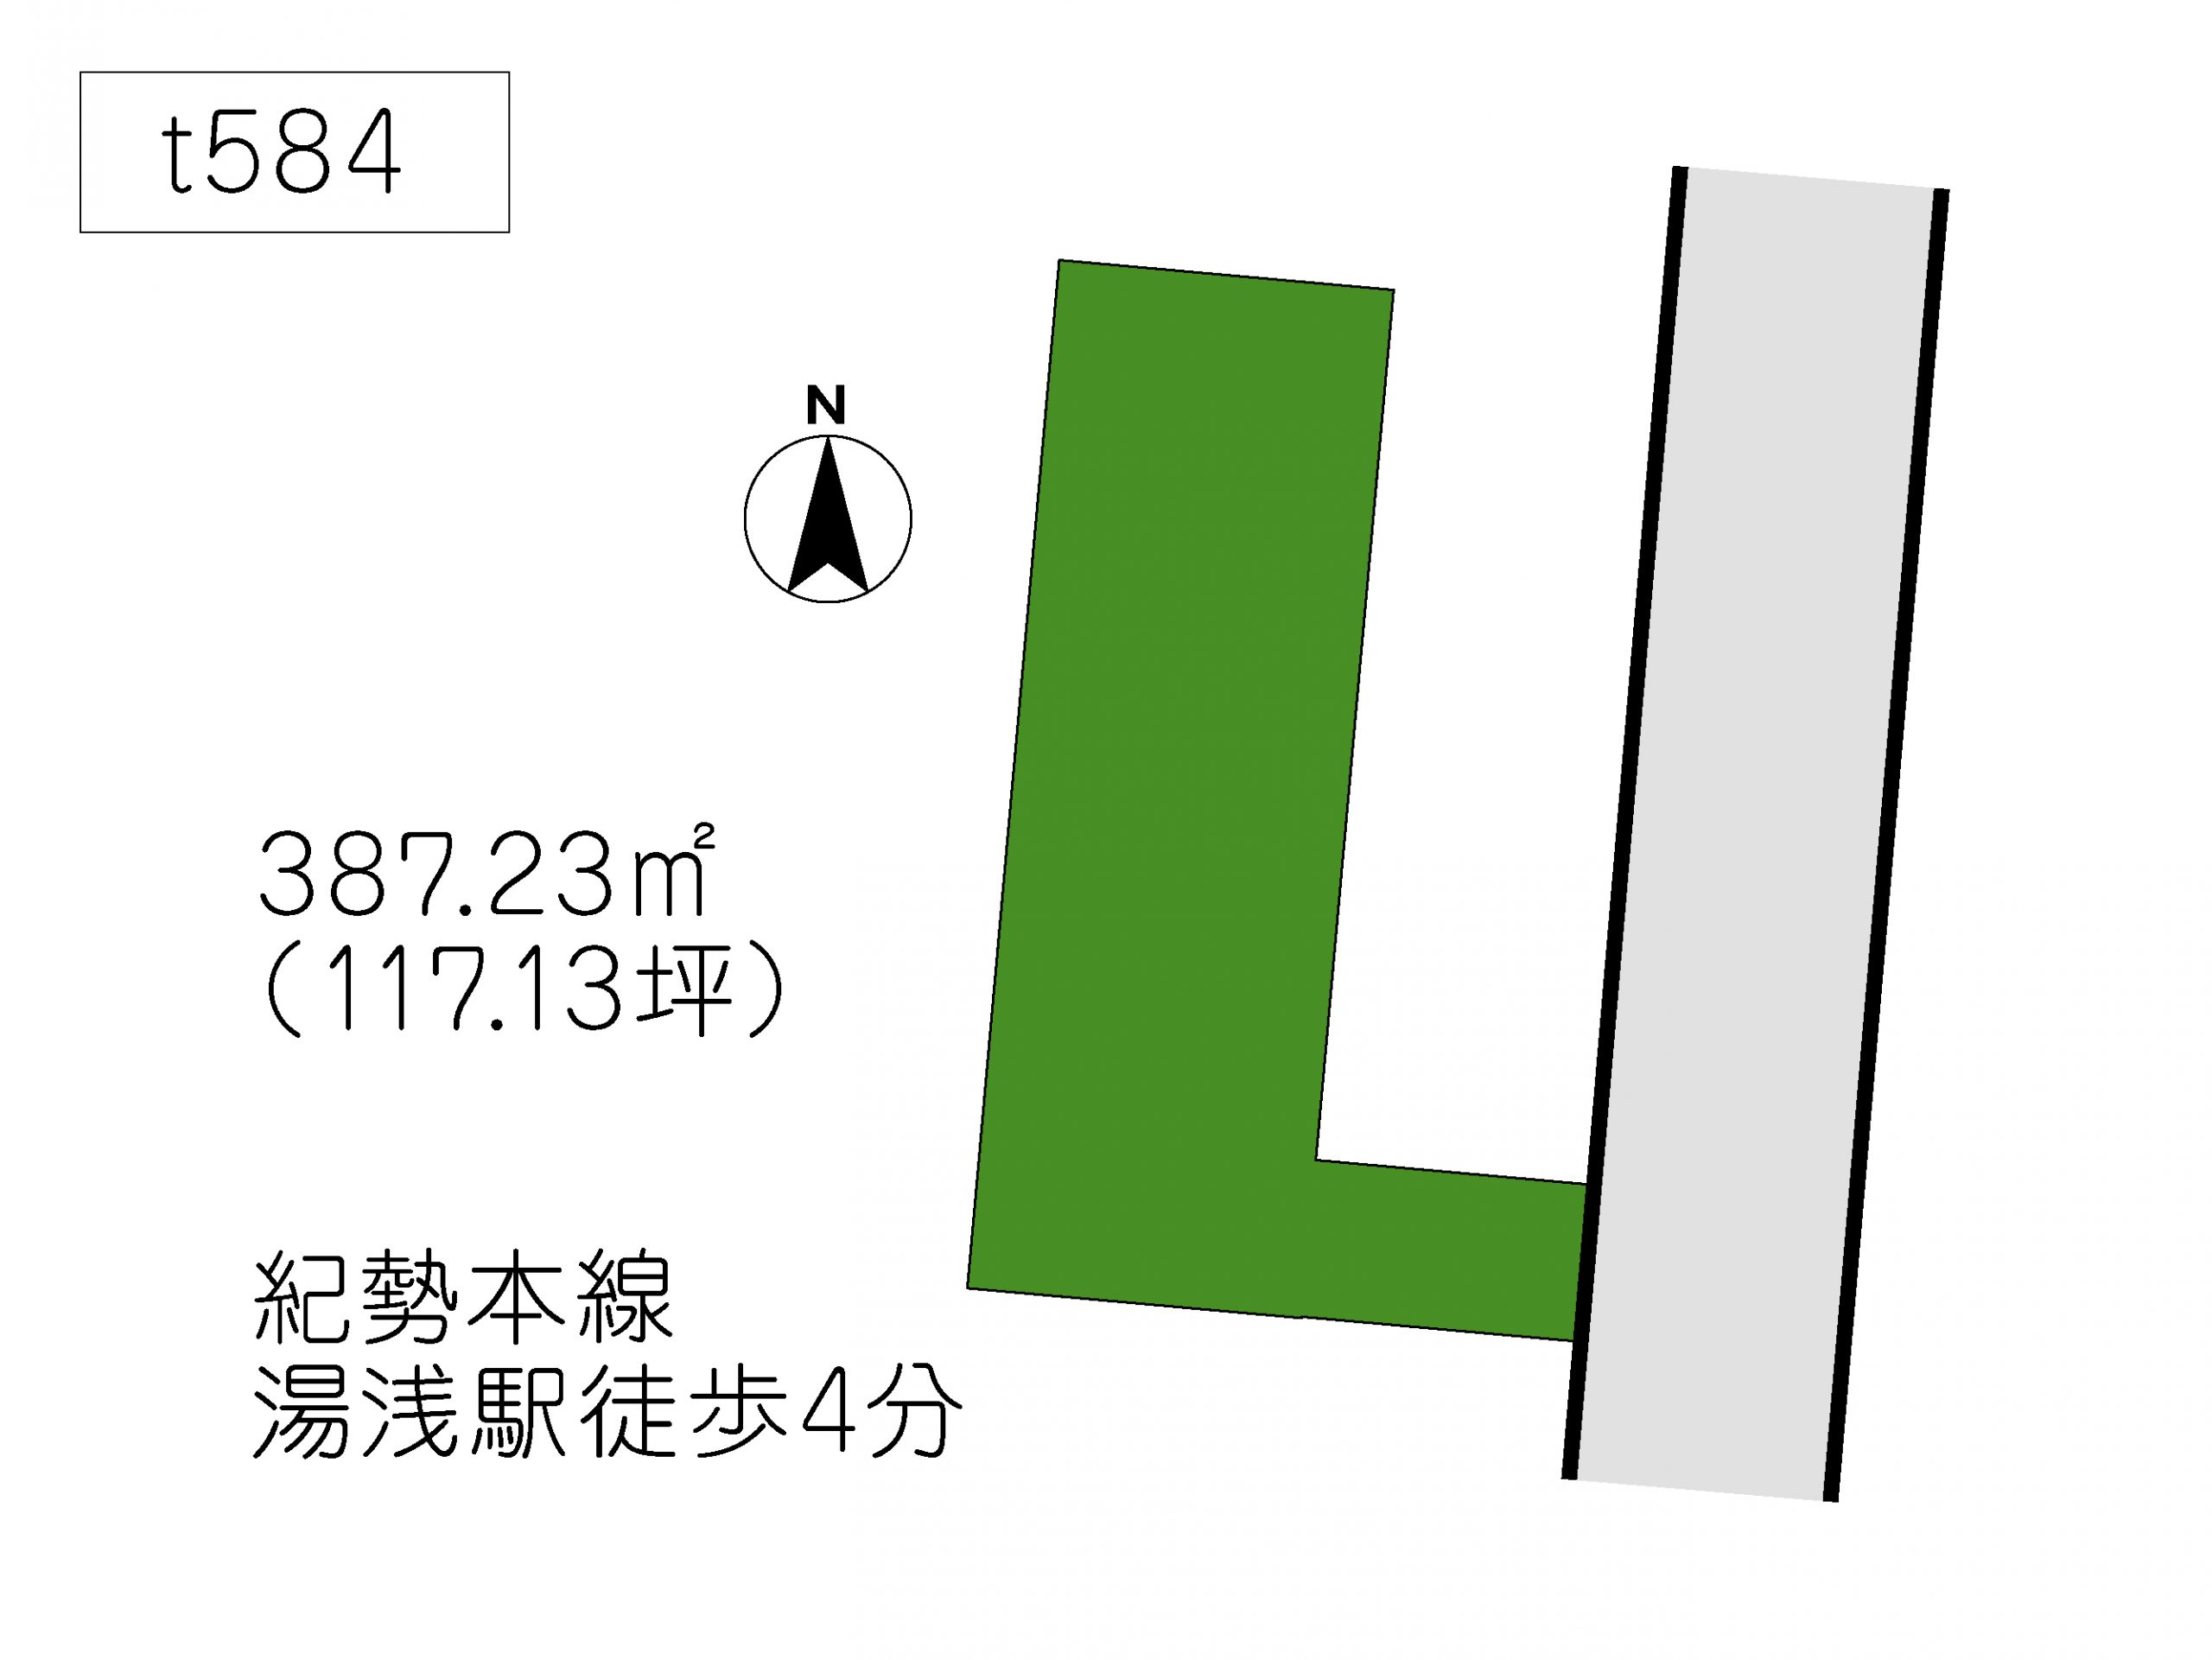 T584 湯浅町湯浅